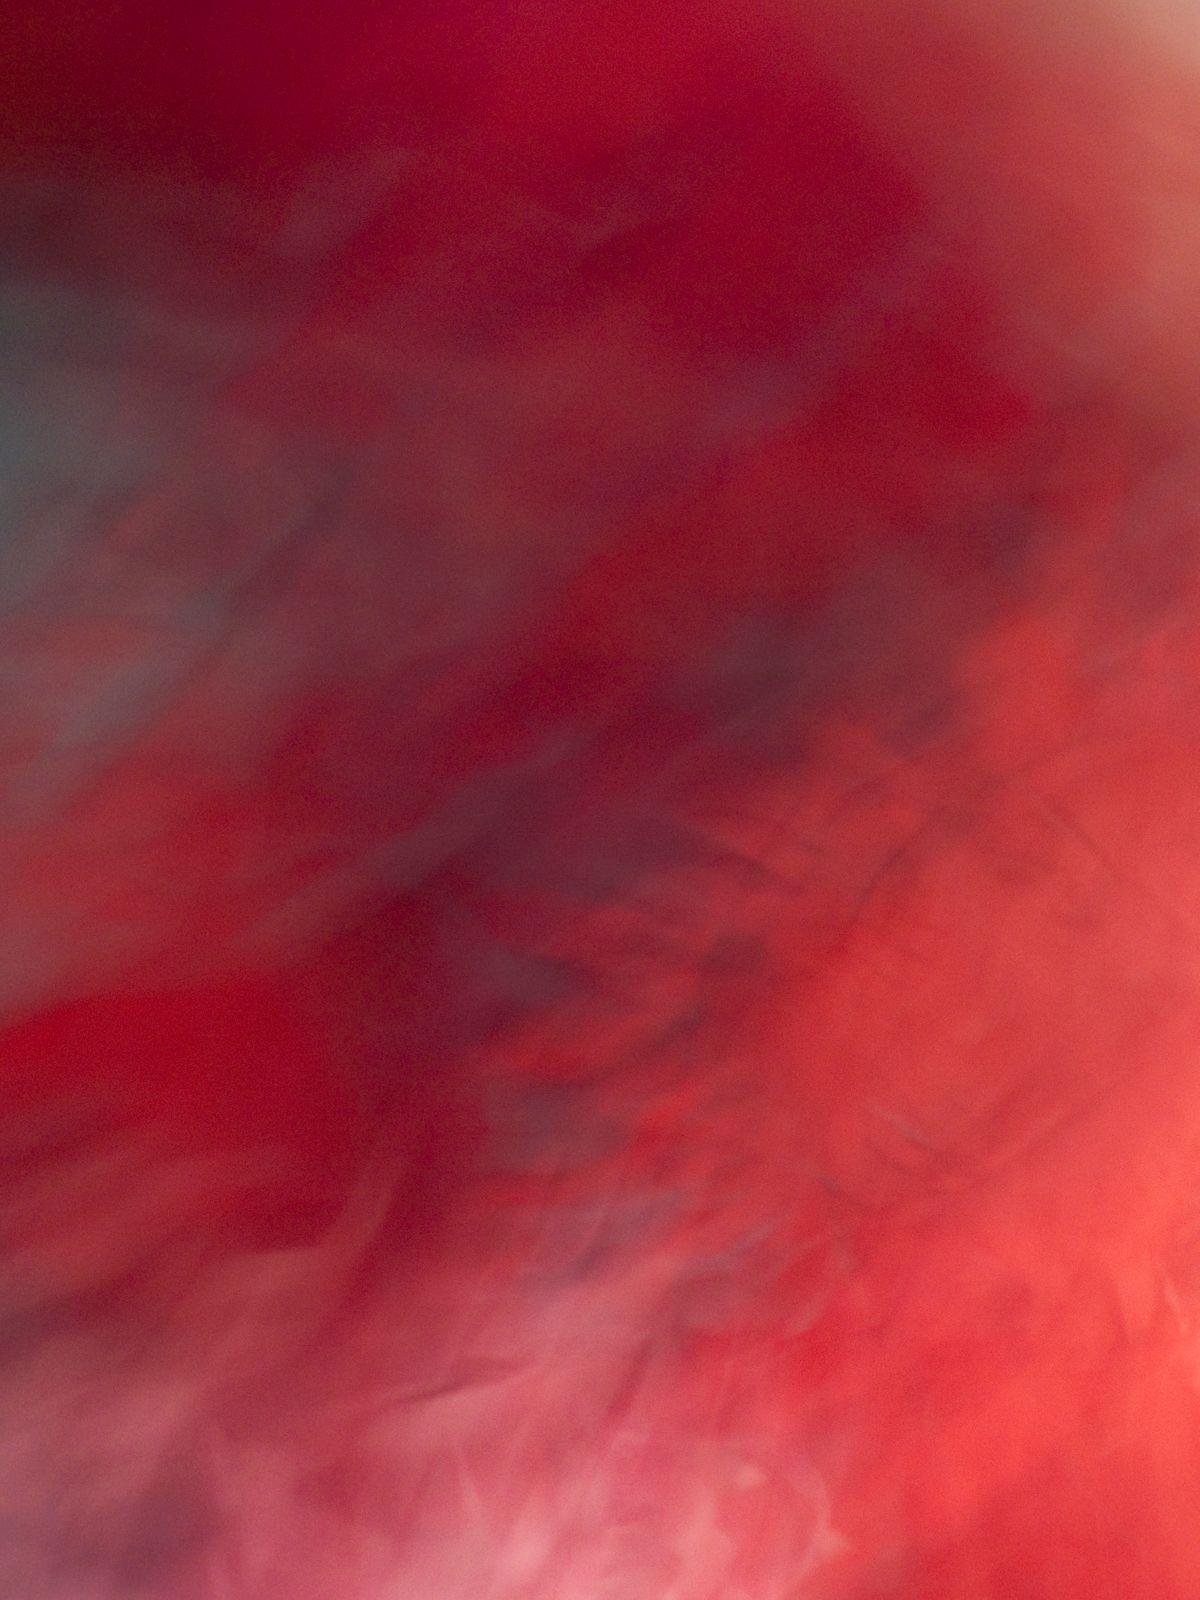 La Vie en Rose, 2012, Abstract Color Photography, Shirine Gill